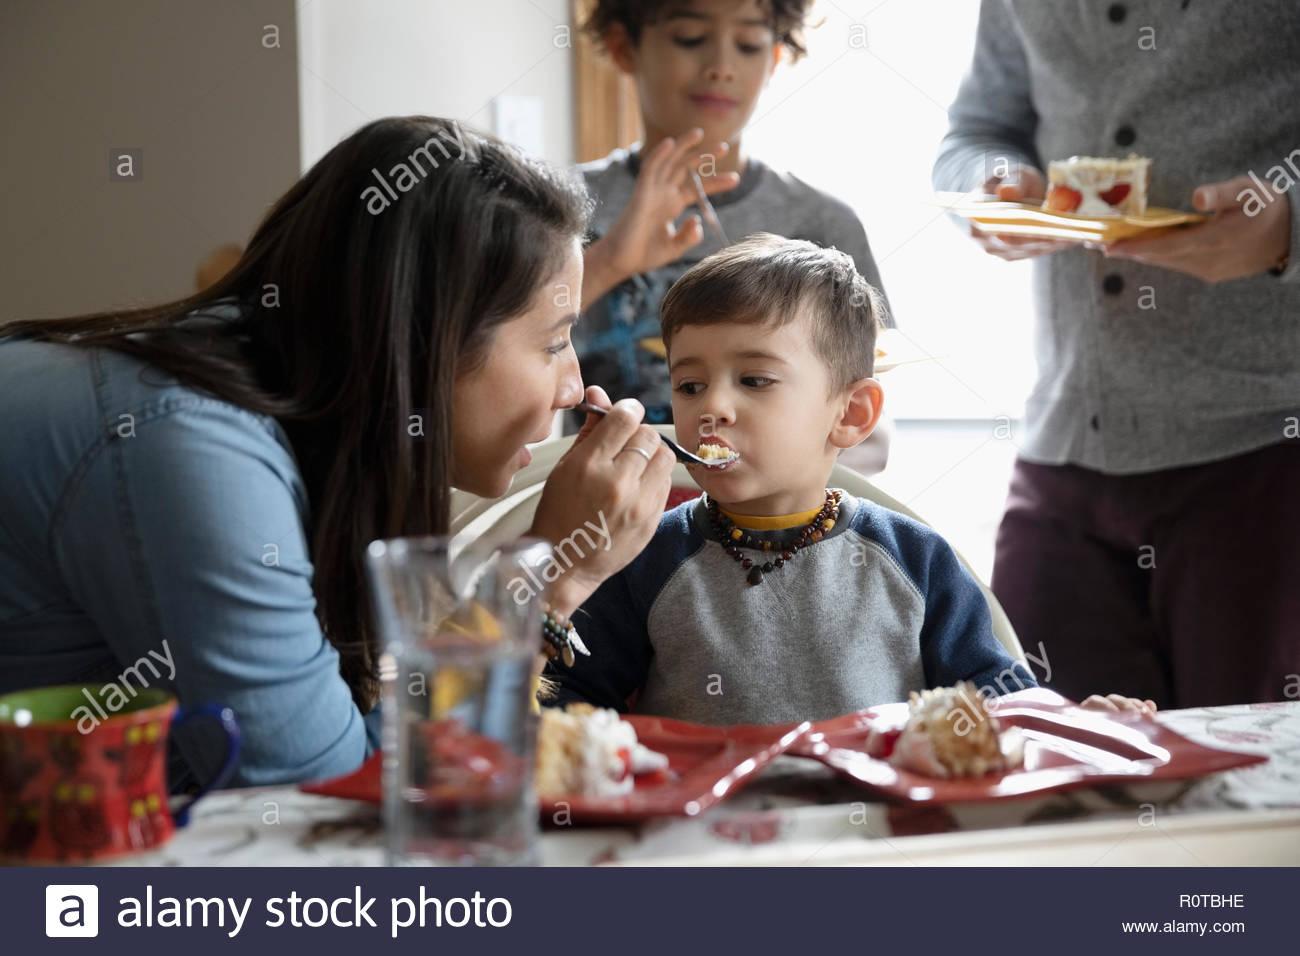 Latinx mother feeding birthday cake to toddler son - Stock Image